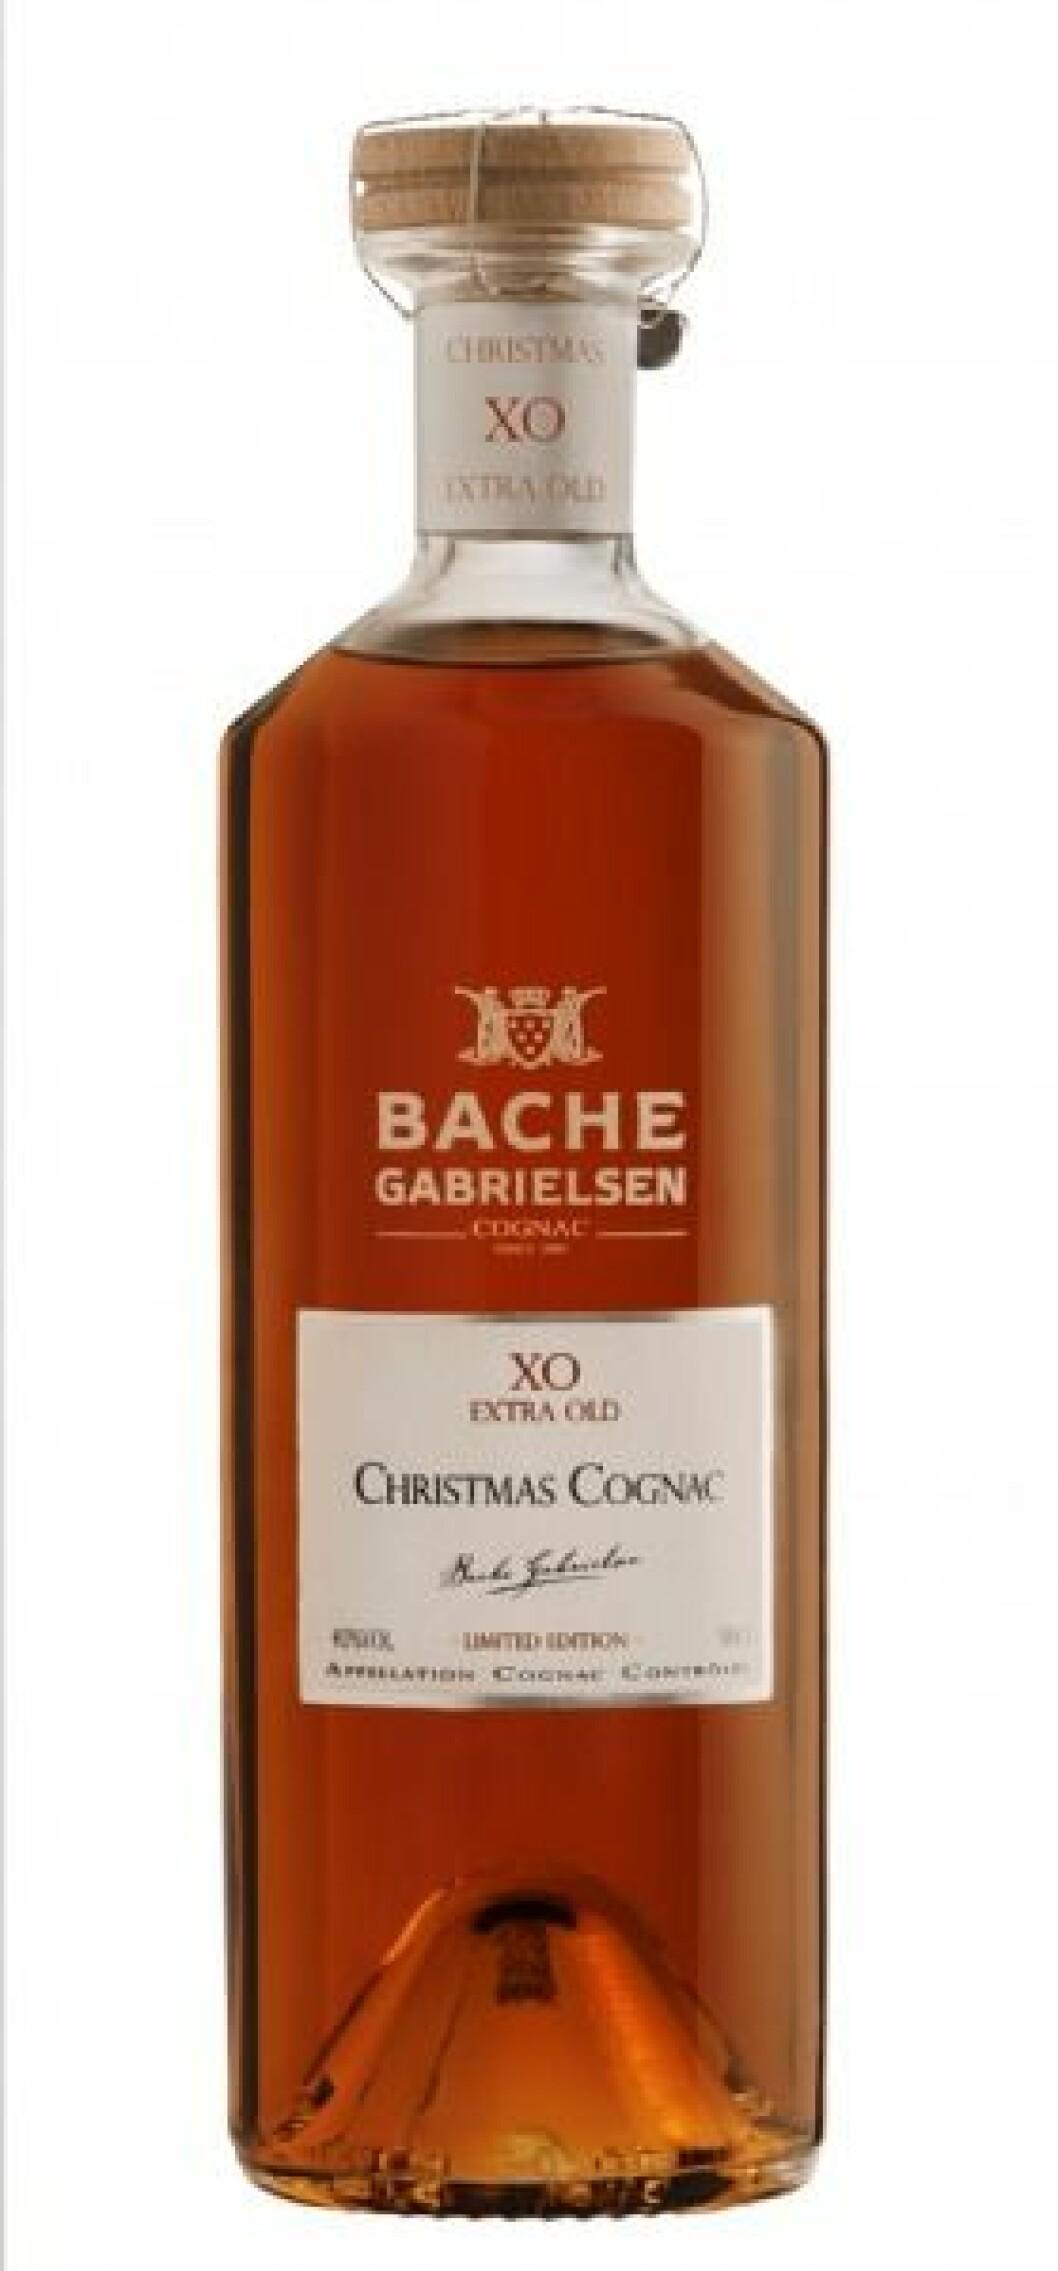 Bache Christmas Cognac